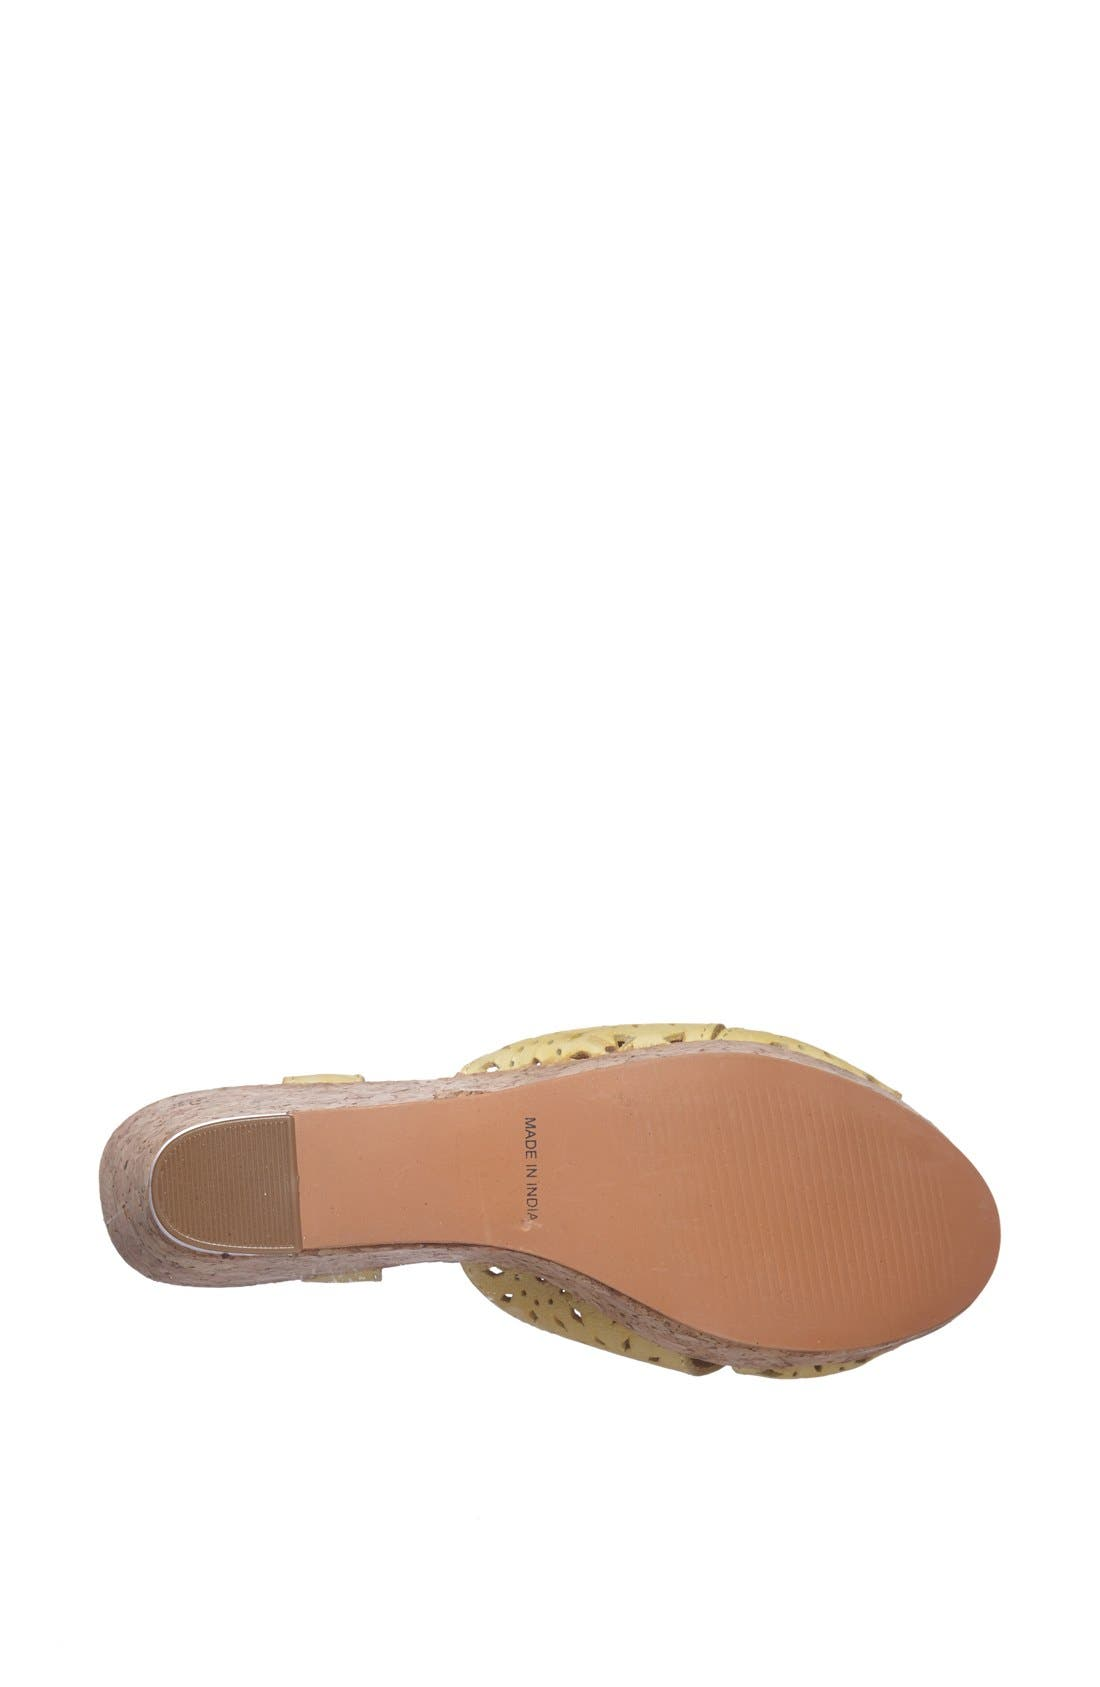 Alternate Image 4  - Matisse 'Sweet' Leather T-Strap Wedge Sandal